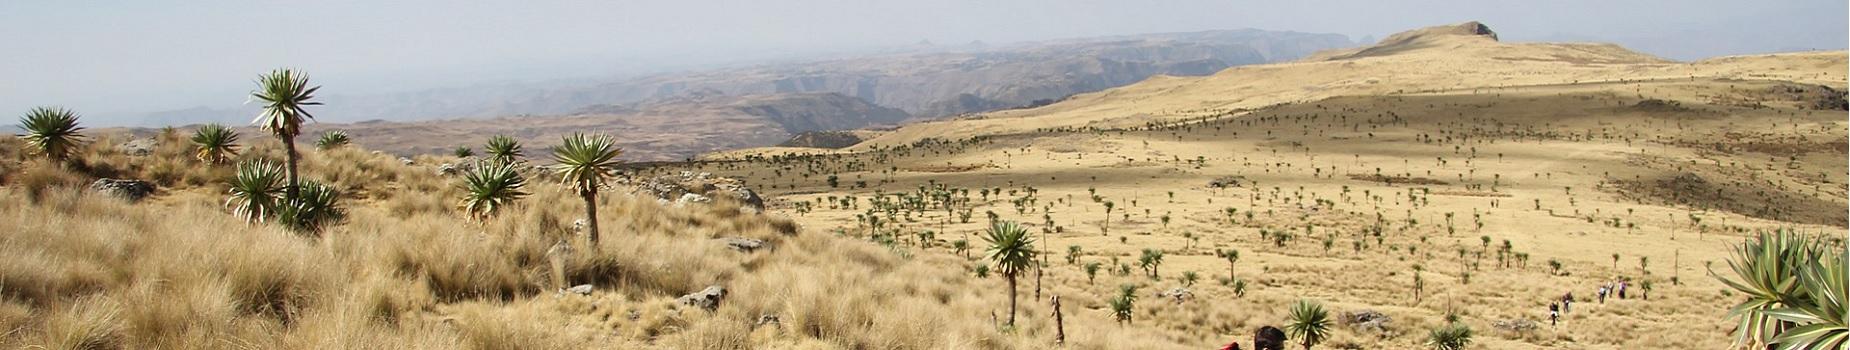 Vliegvelden Ethiopië